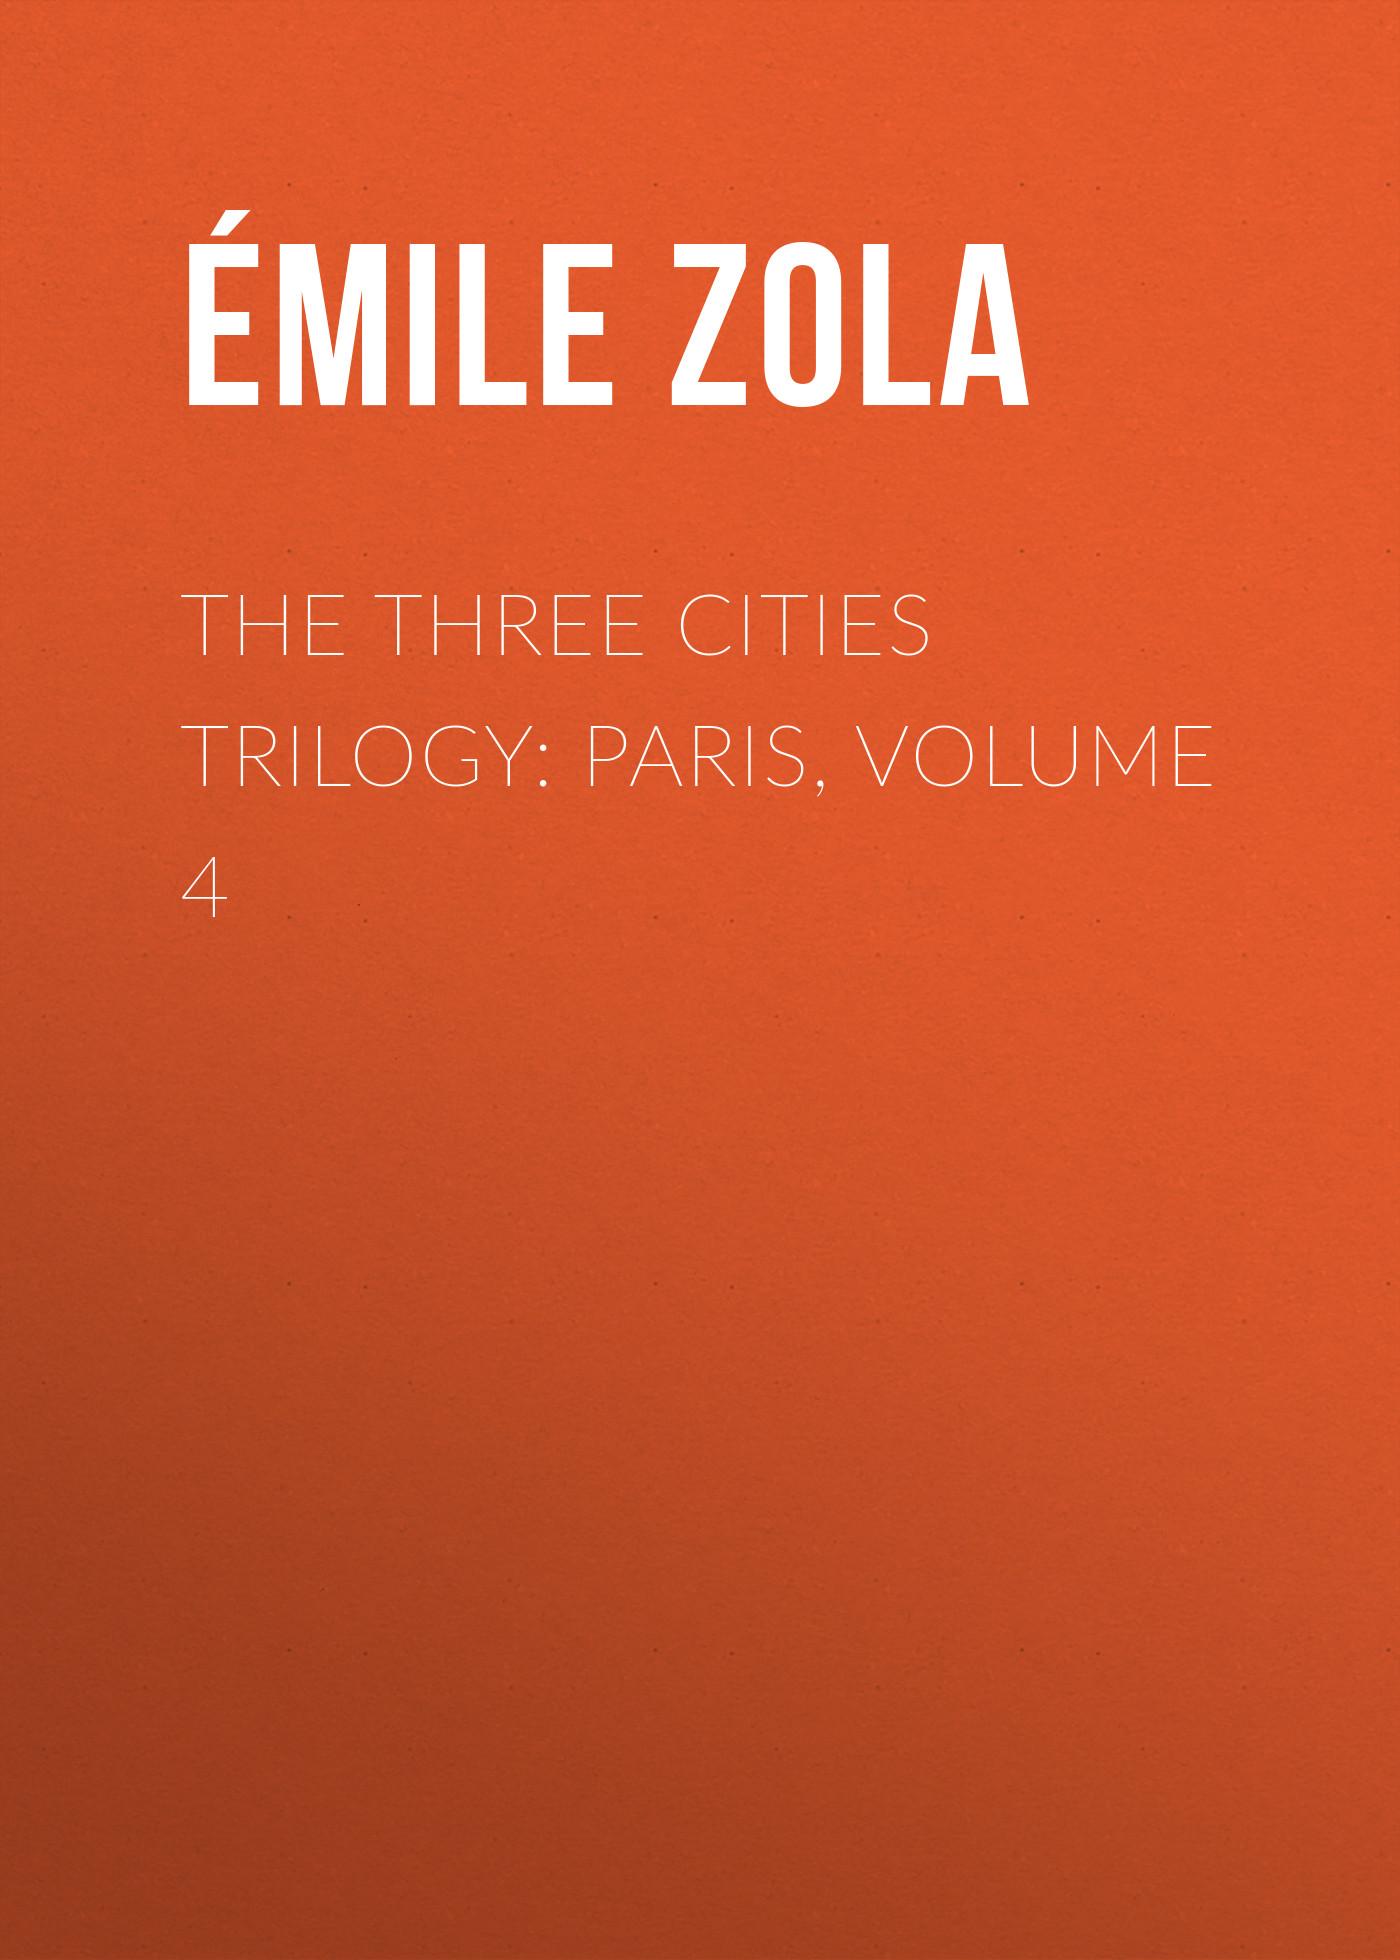 Эмиль Золя The Three Cities Trilogy: Paris, Volume 4 эмиль золя the three cities trilogy paris volume 2